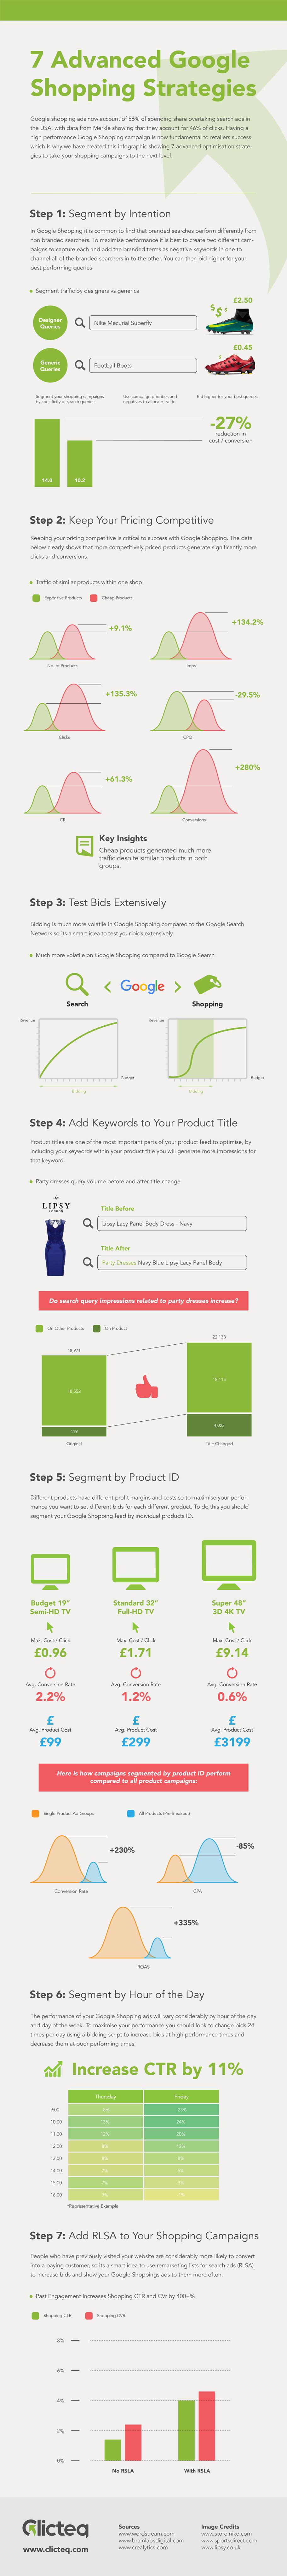 7 Advanced Google Shopping Strategies infographic